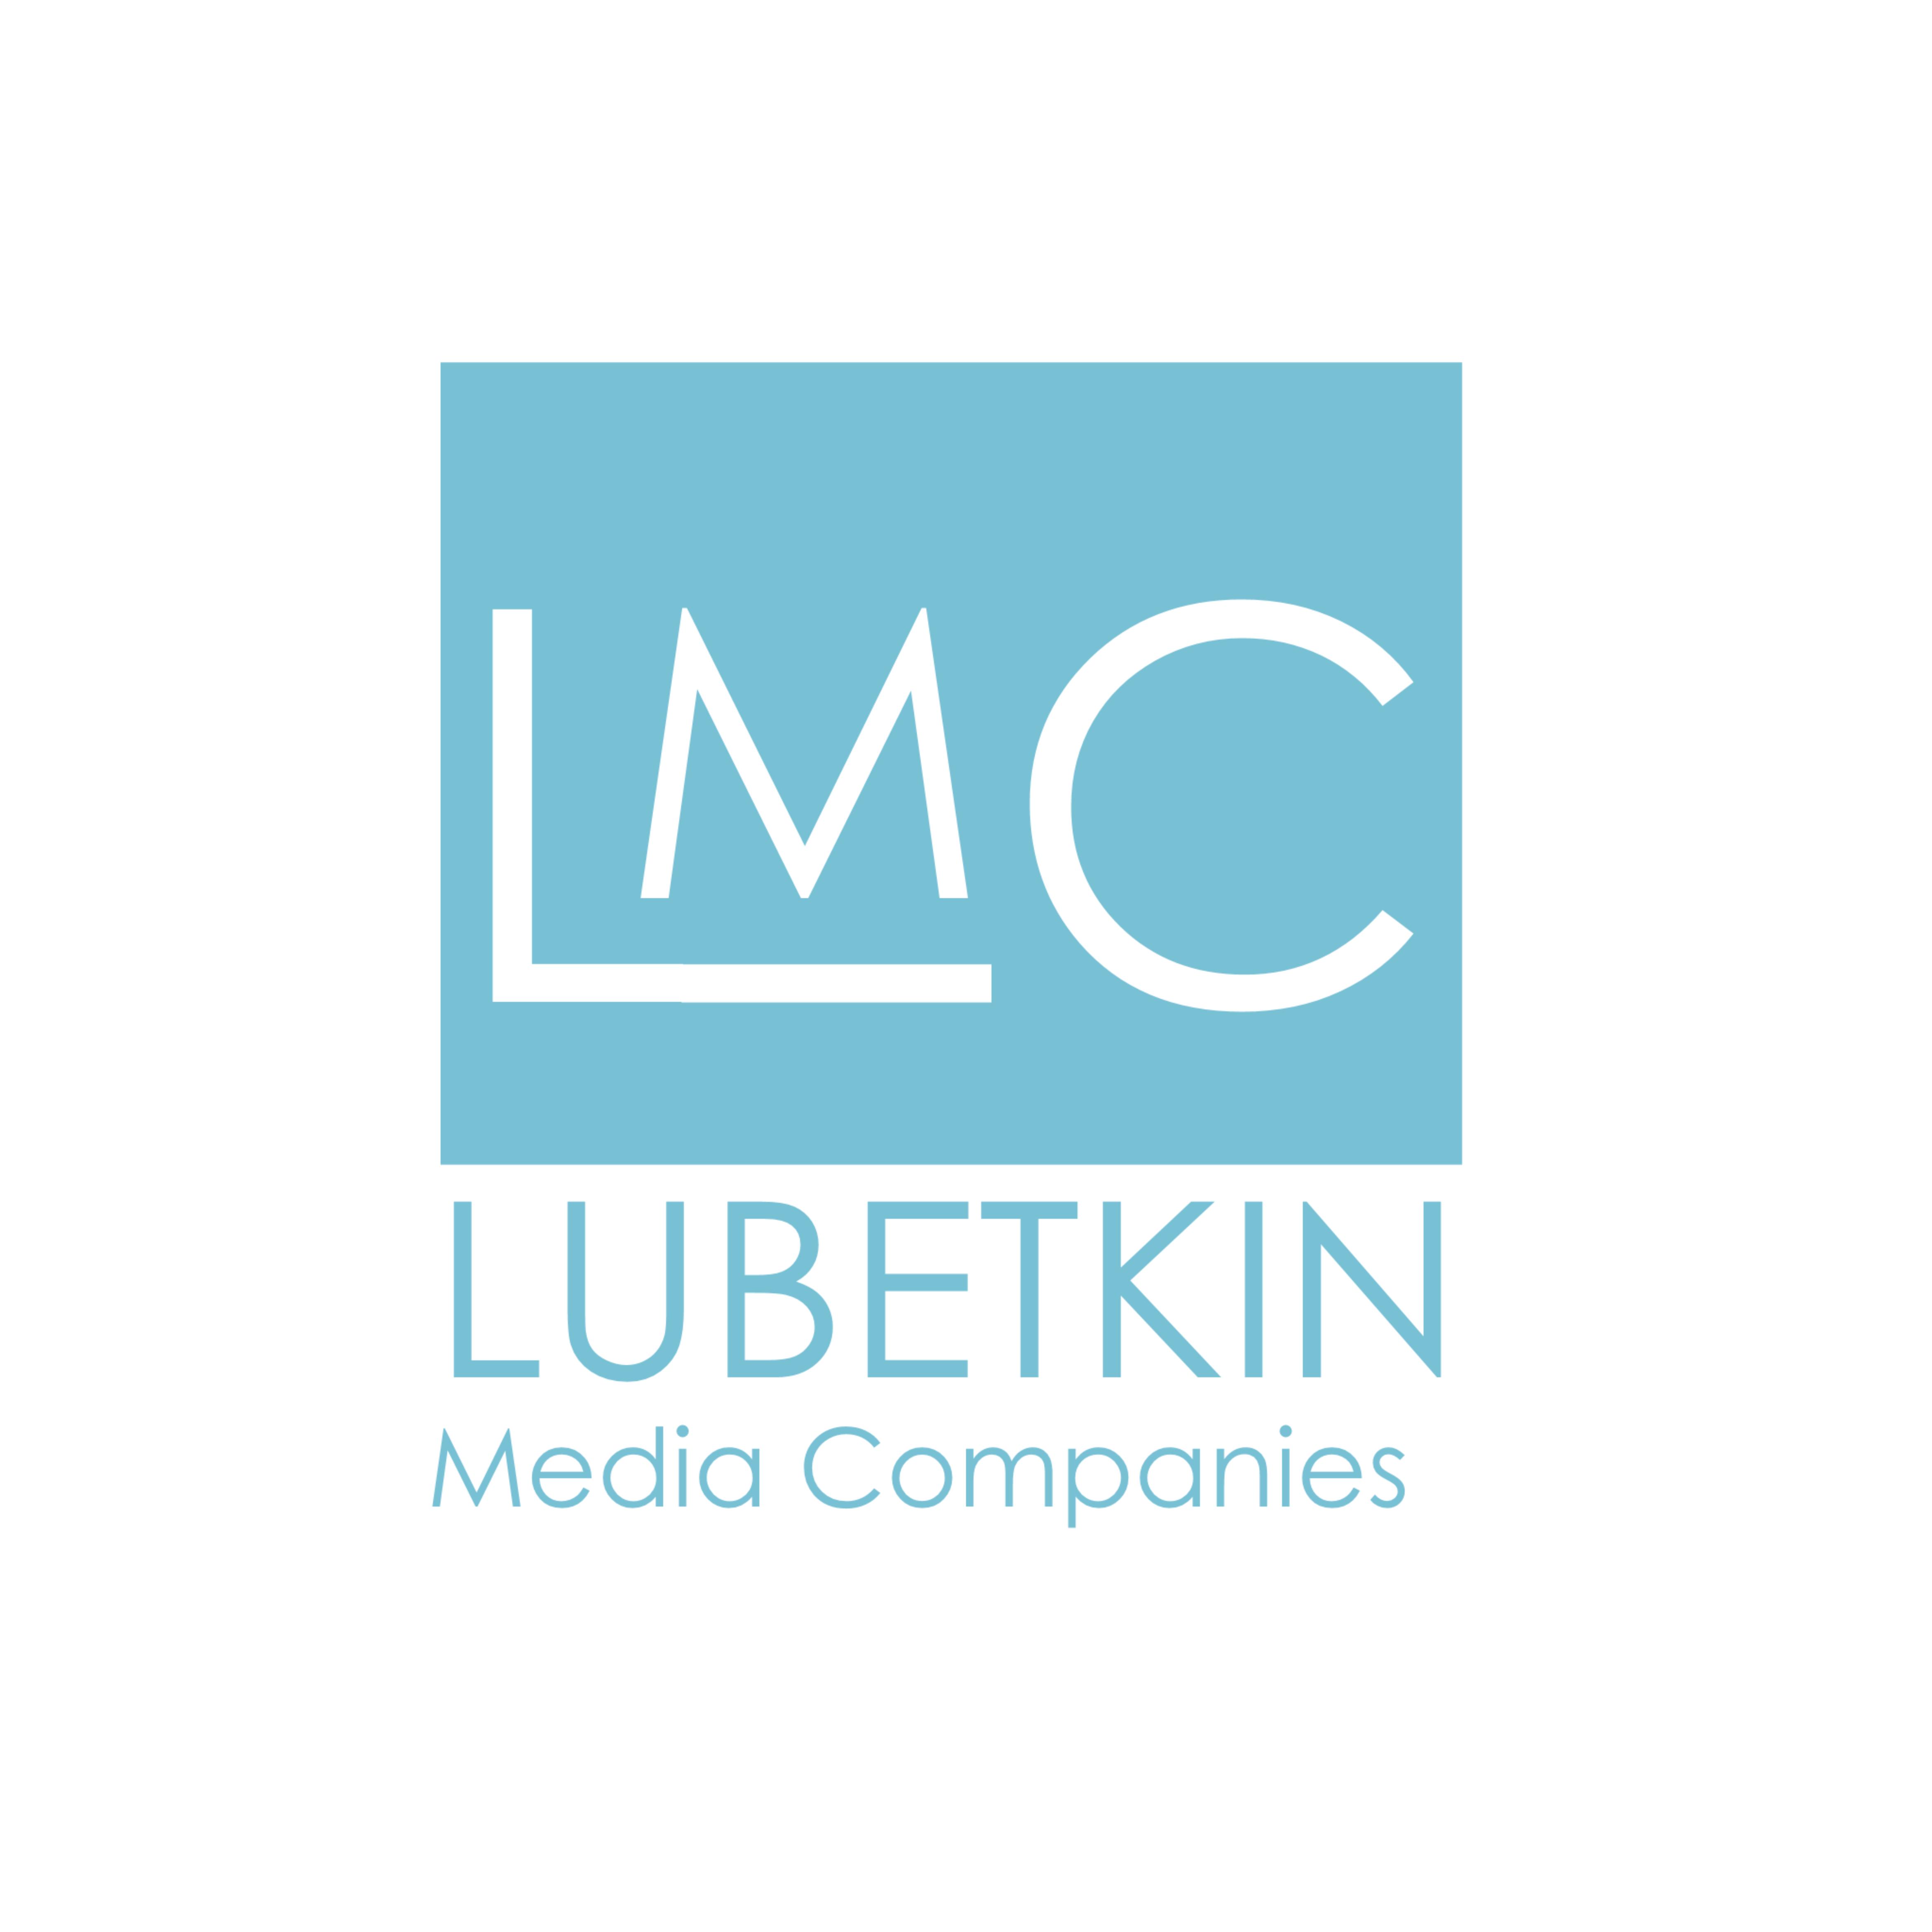 Lubetkin Media Companies – Version 16